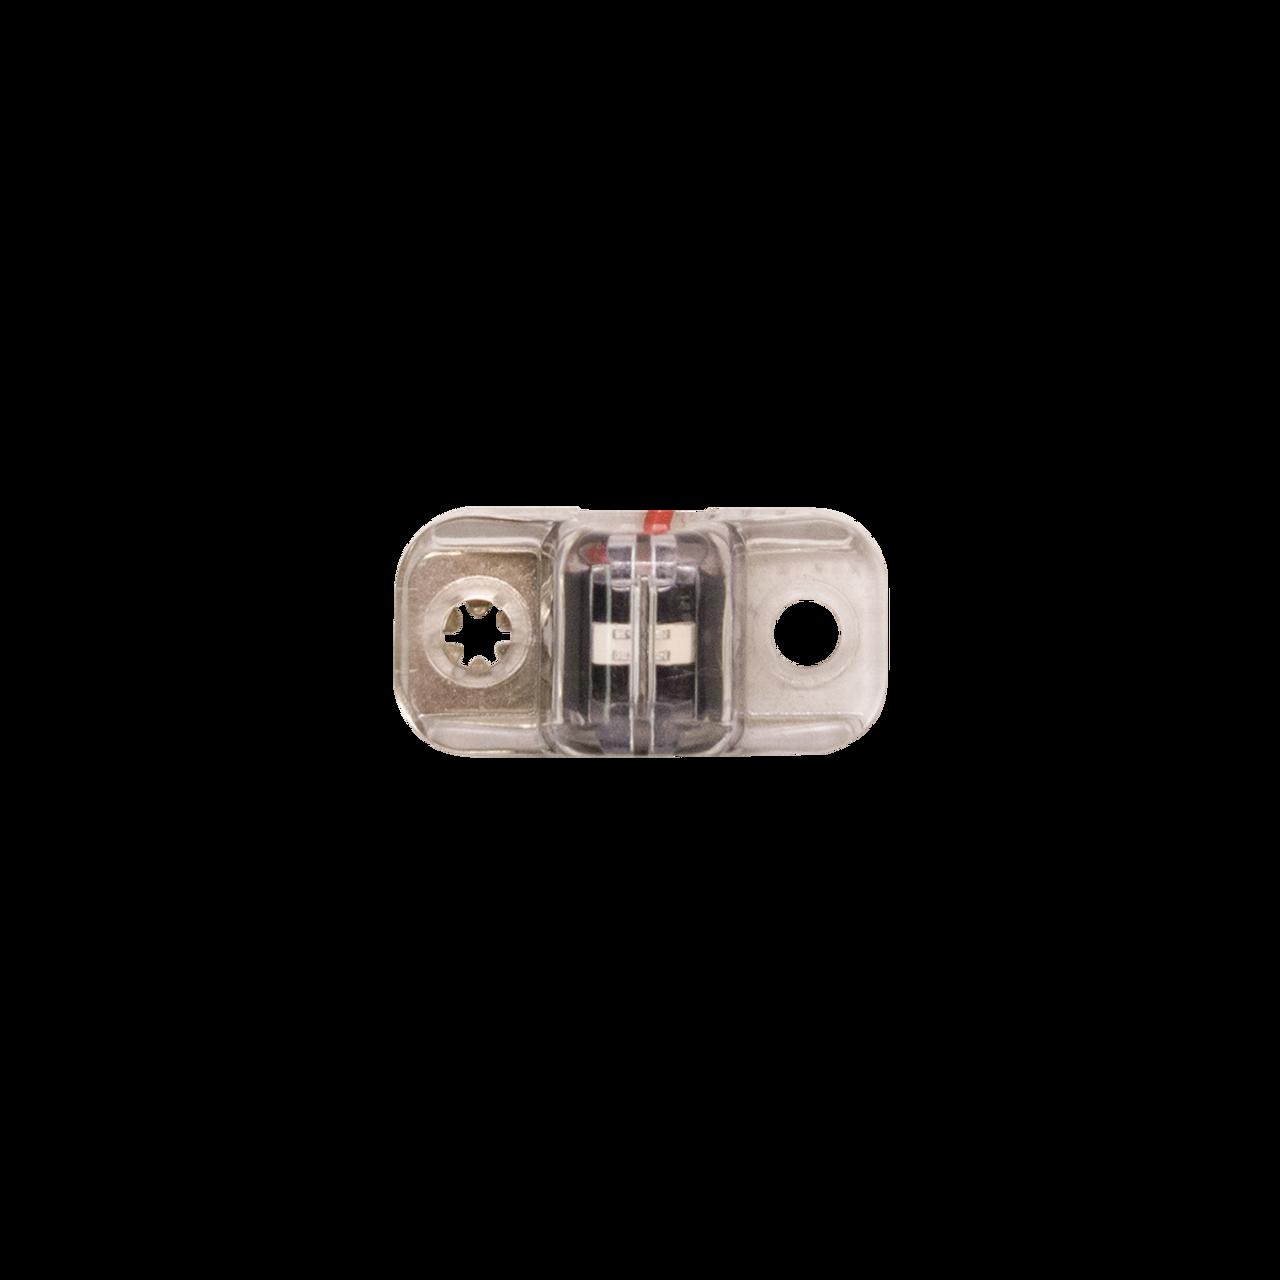 LEDS90A-R --- Amber/Red LED Sealed Submersible Fender Light